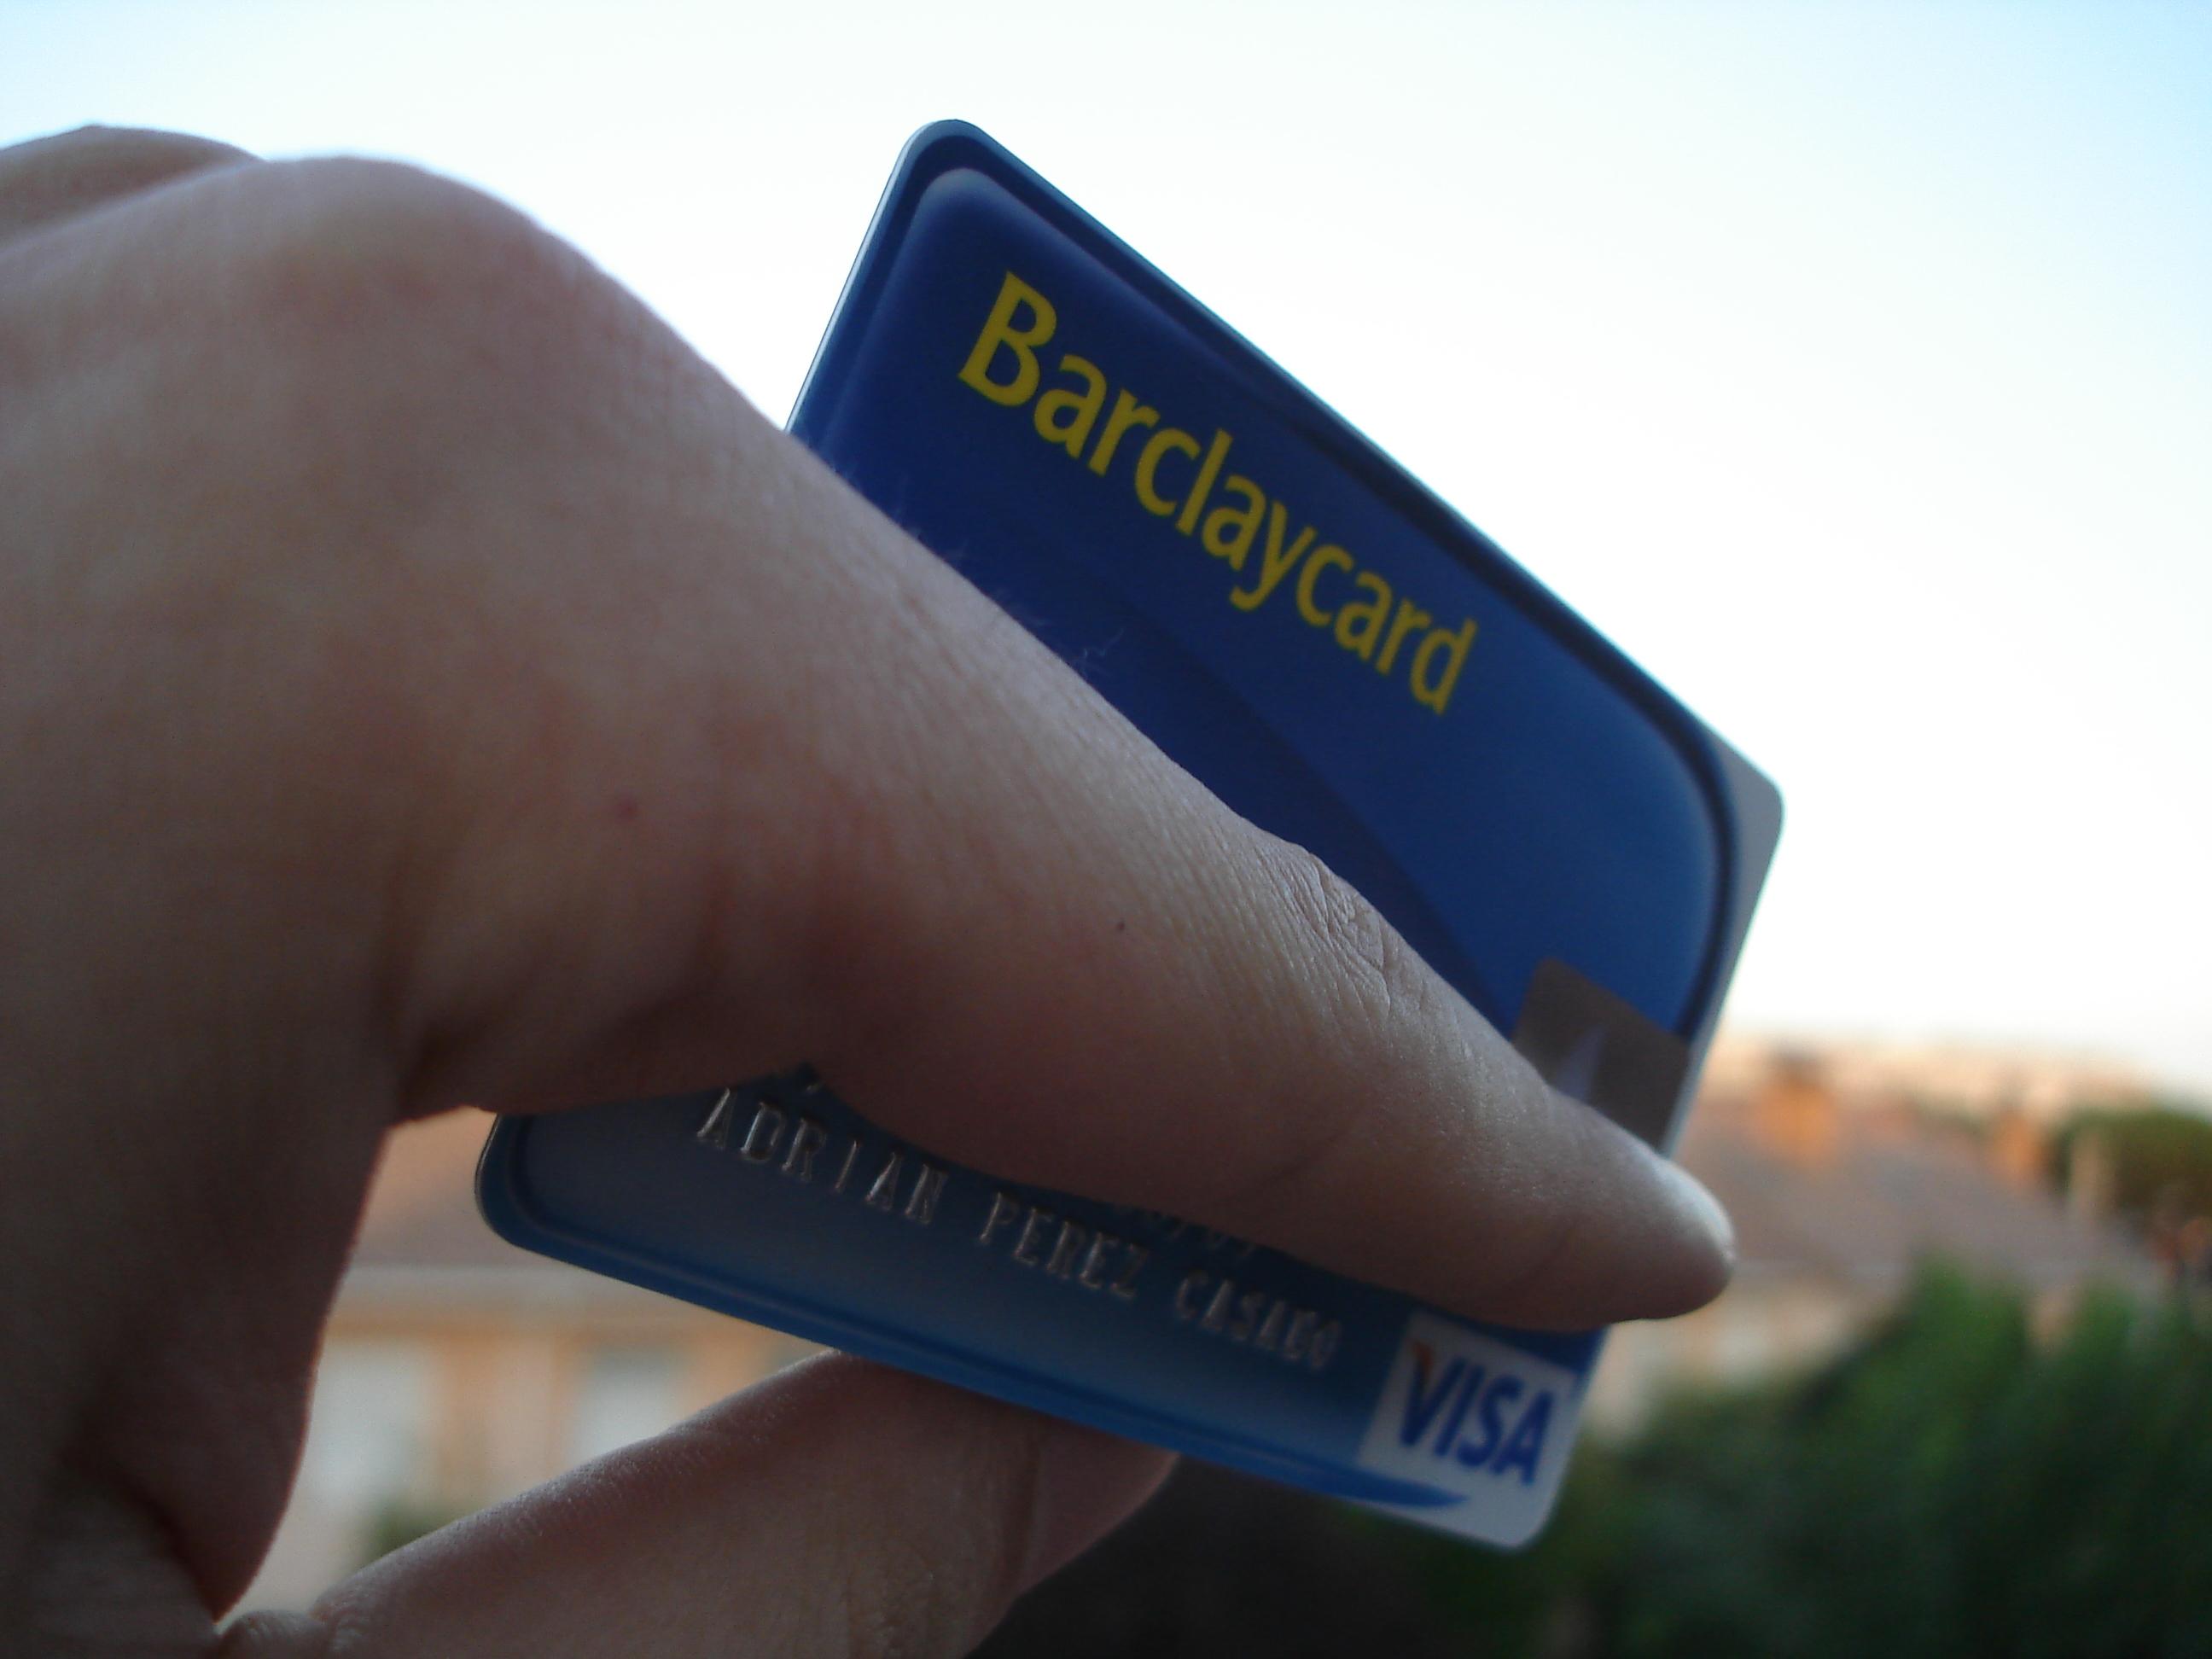 Key Bank Business Credit Card Customer Service Images - Card ...